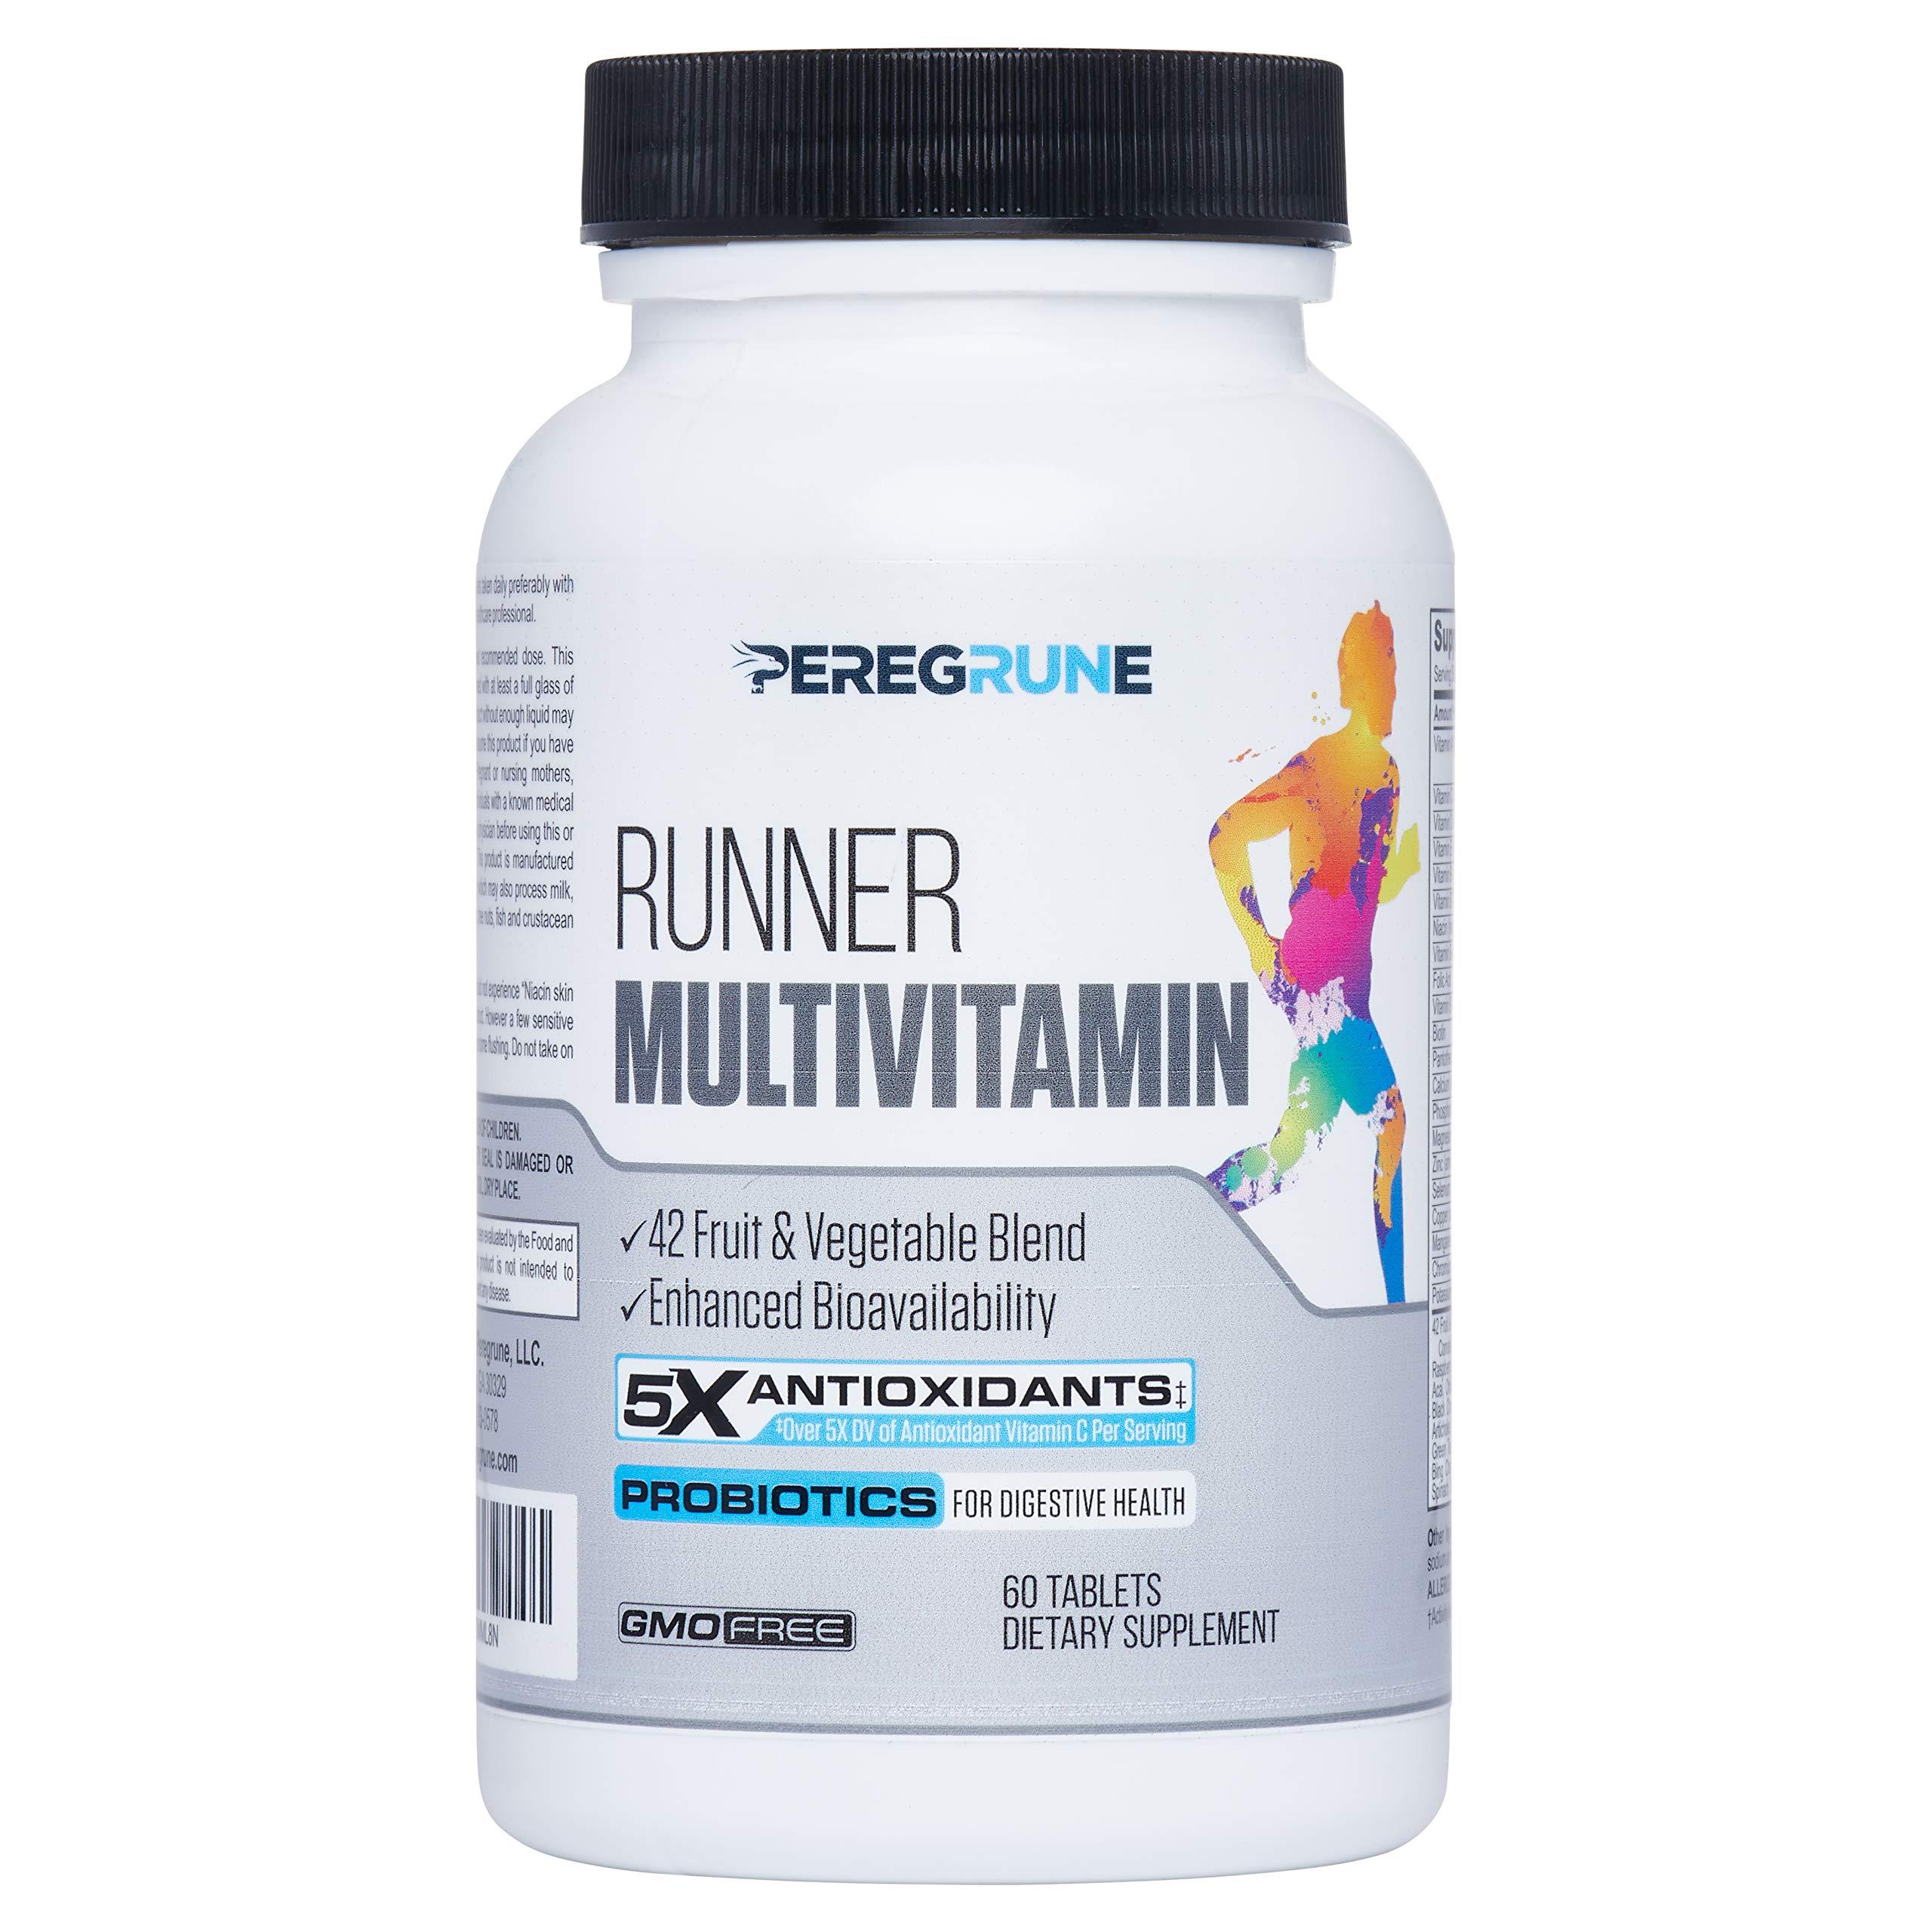 Runner Multivitamin Engineered Antioxidants Certified